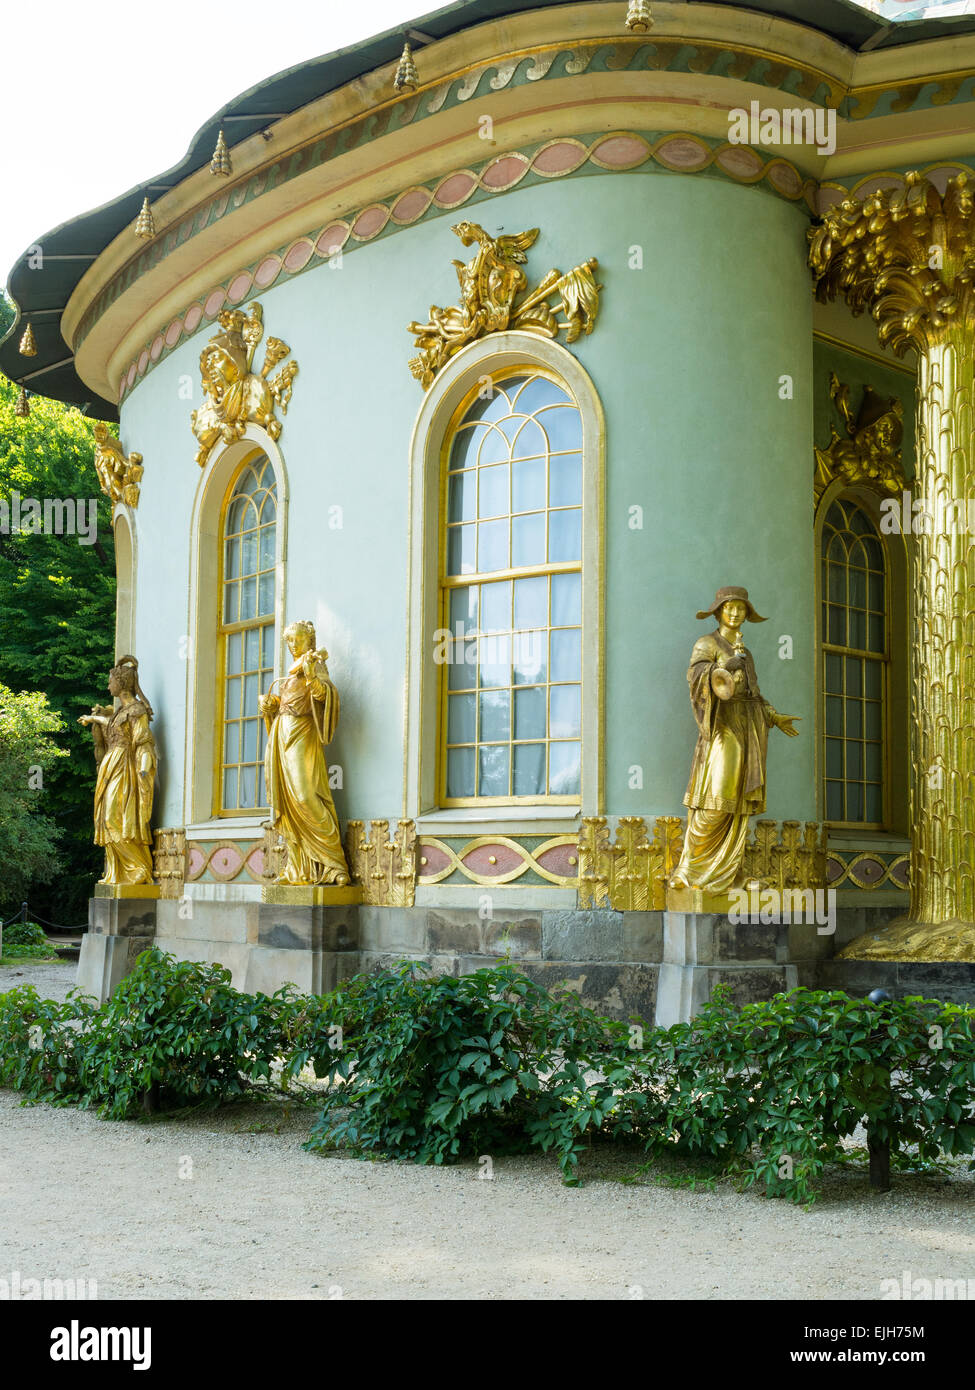 The Chinese tea house, Sanssouci park, Potsdam, Germany - Stock Image